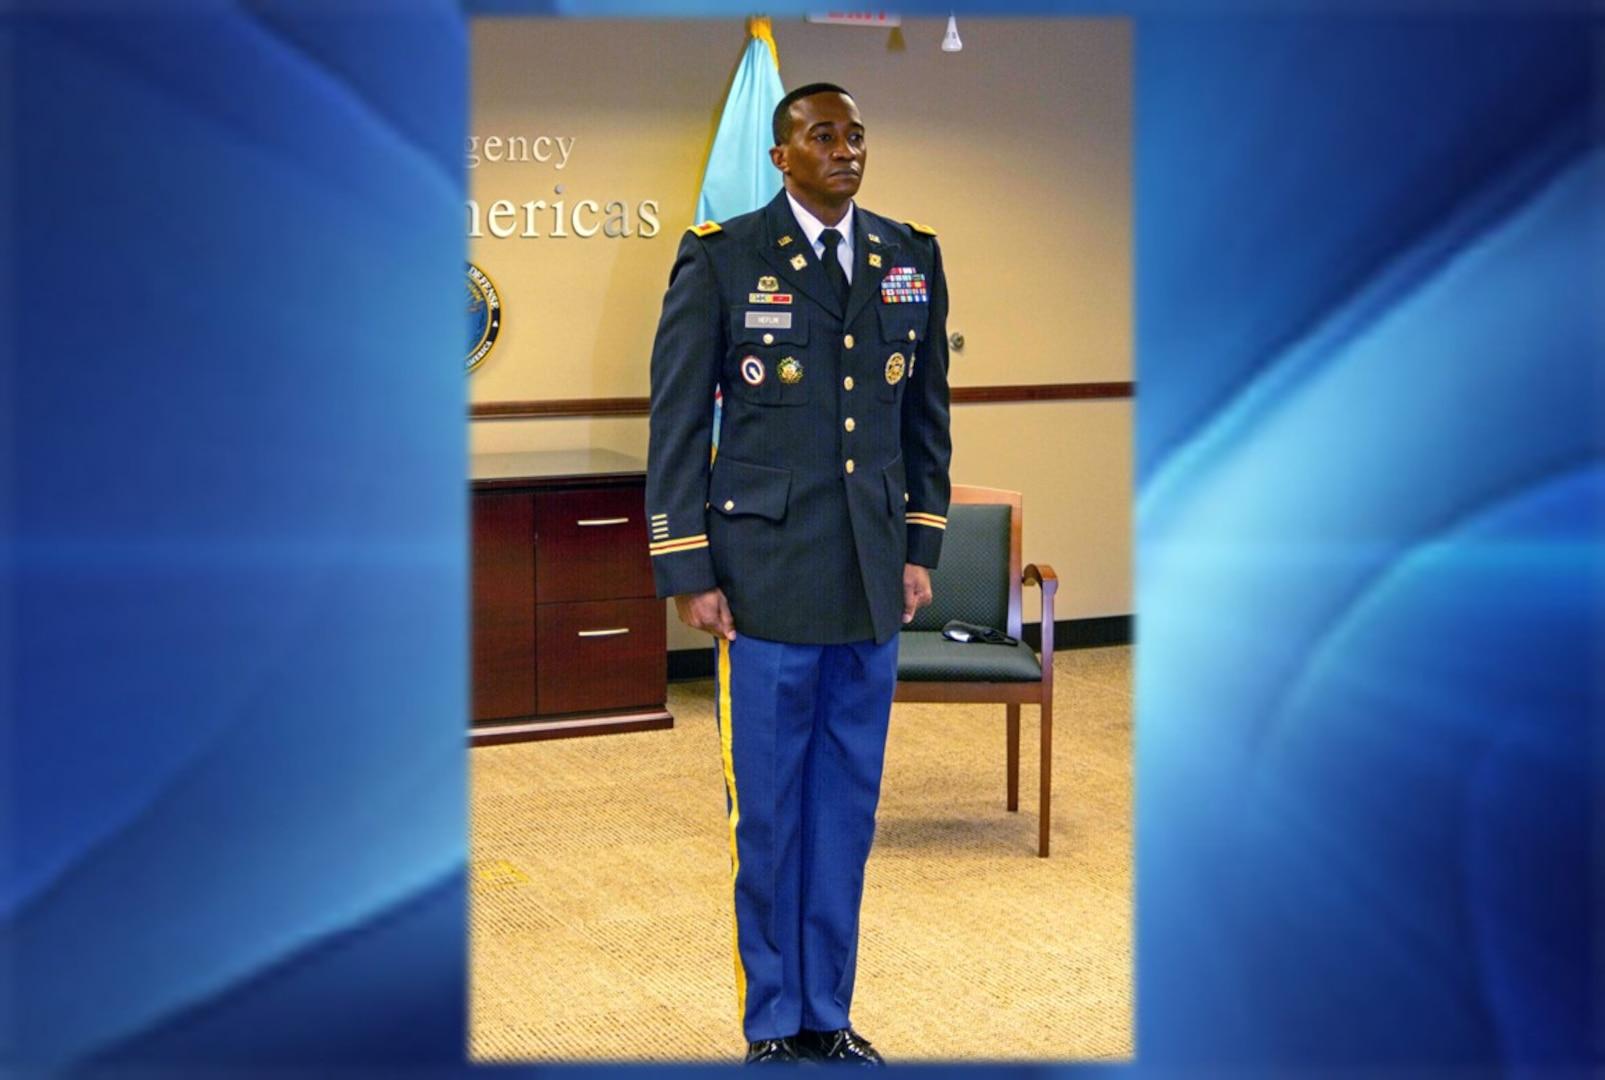 Army Col. Raphael S. Heflin